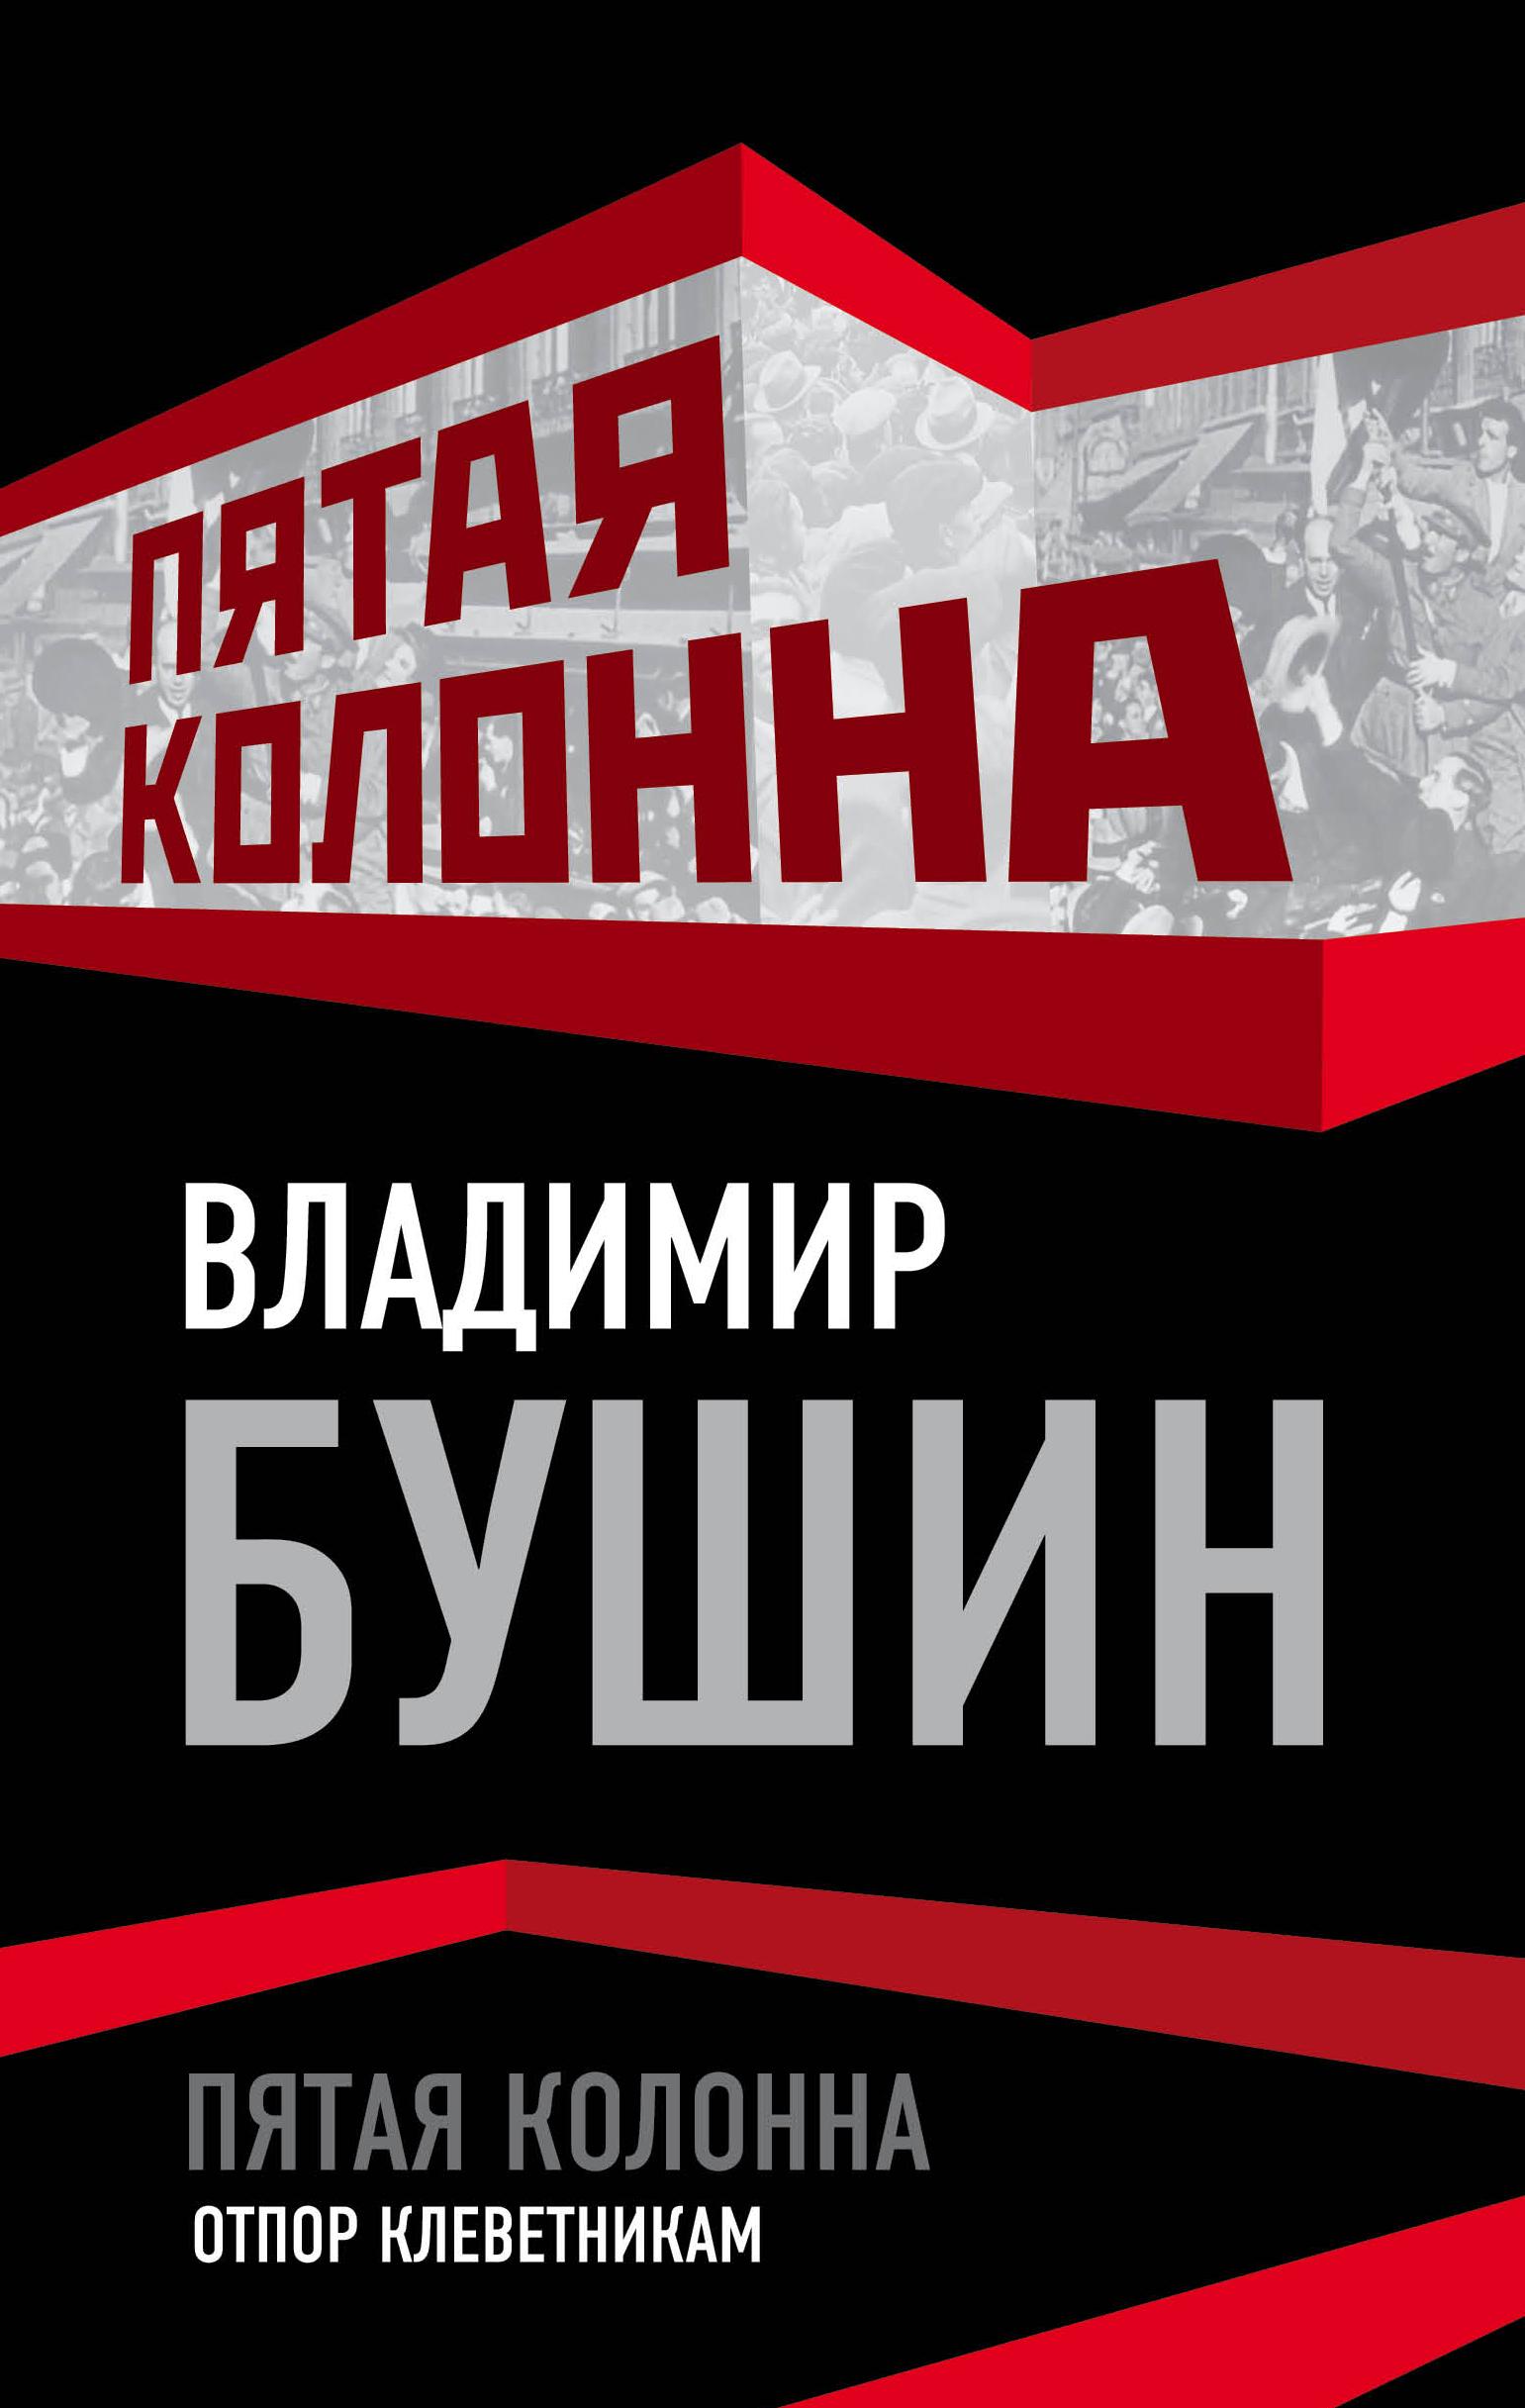 Пятая колонна. Отпор клеветникам / Владимир Бушин